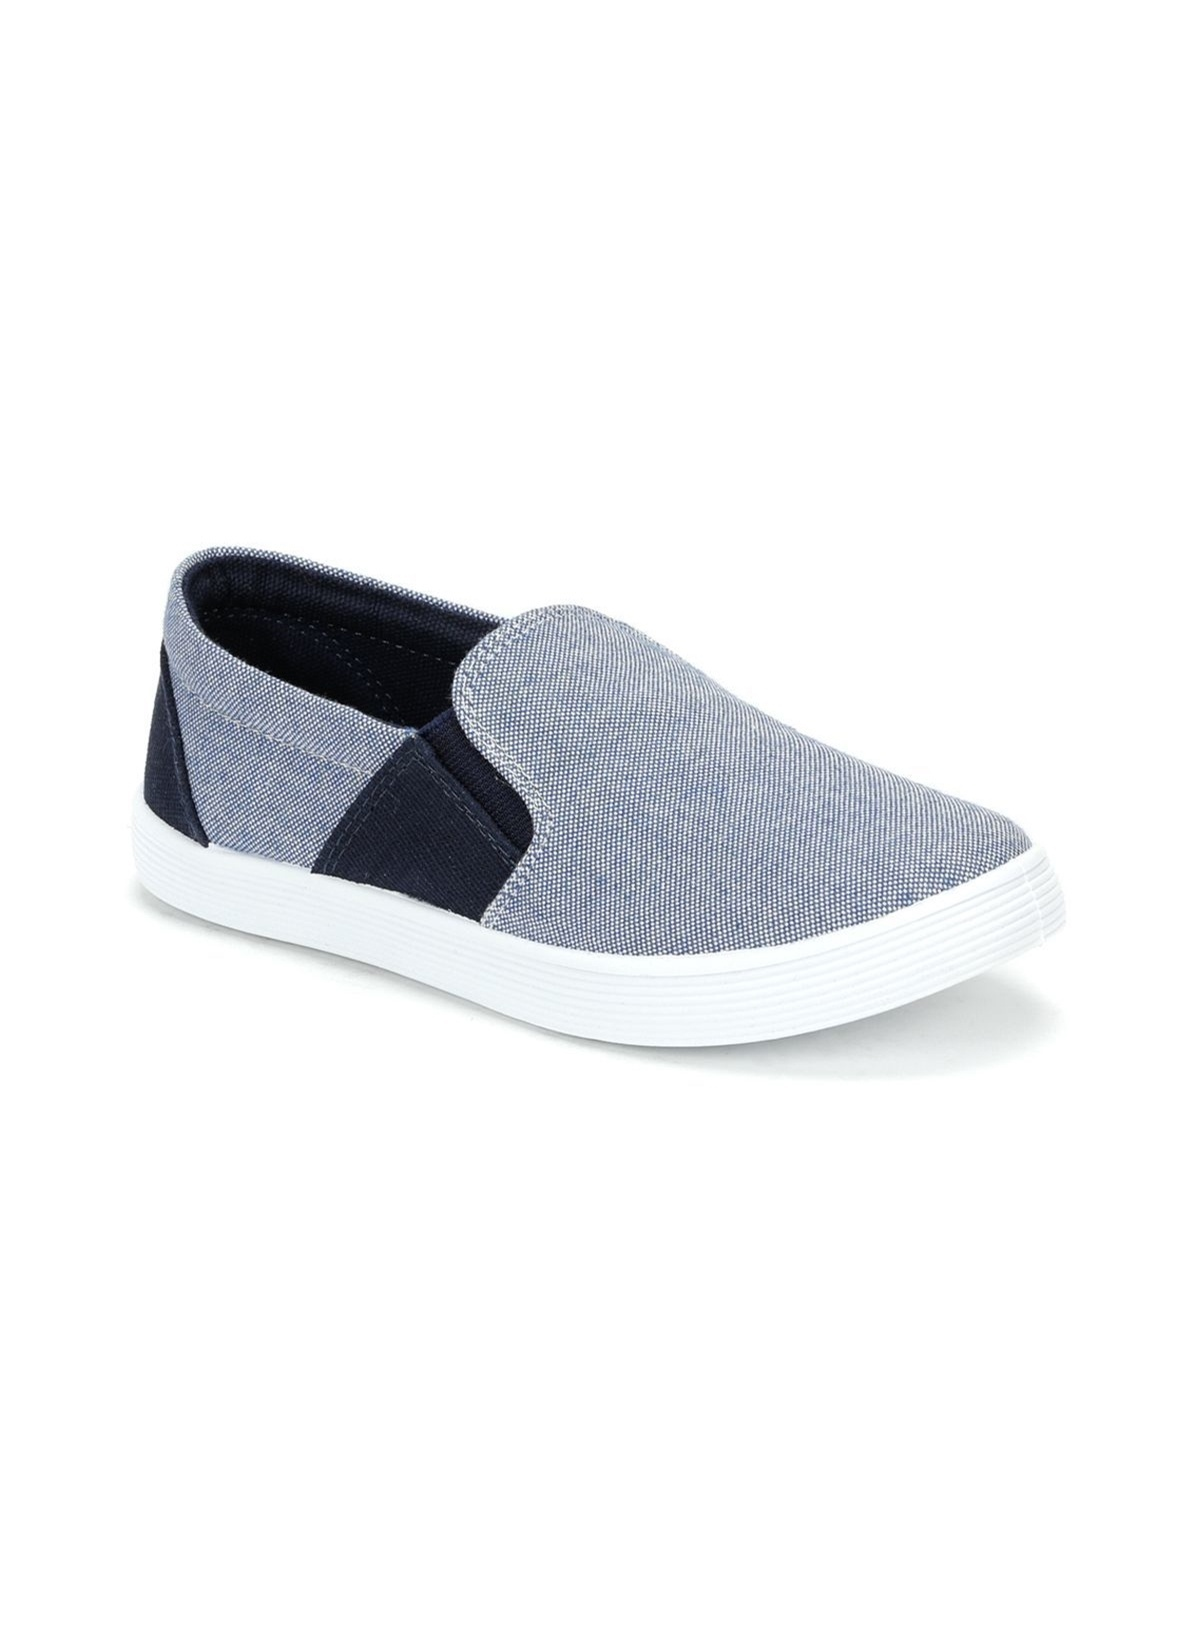 Polaris Ayakkabı 81.508268.f Slip On – 23.0 TL